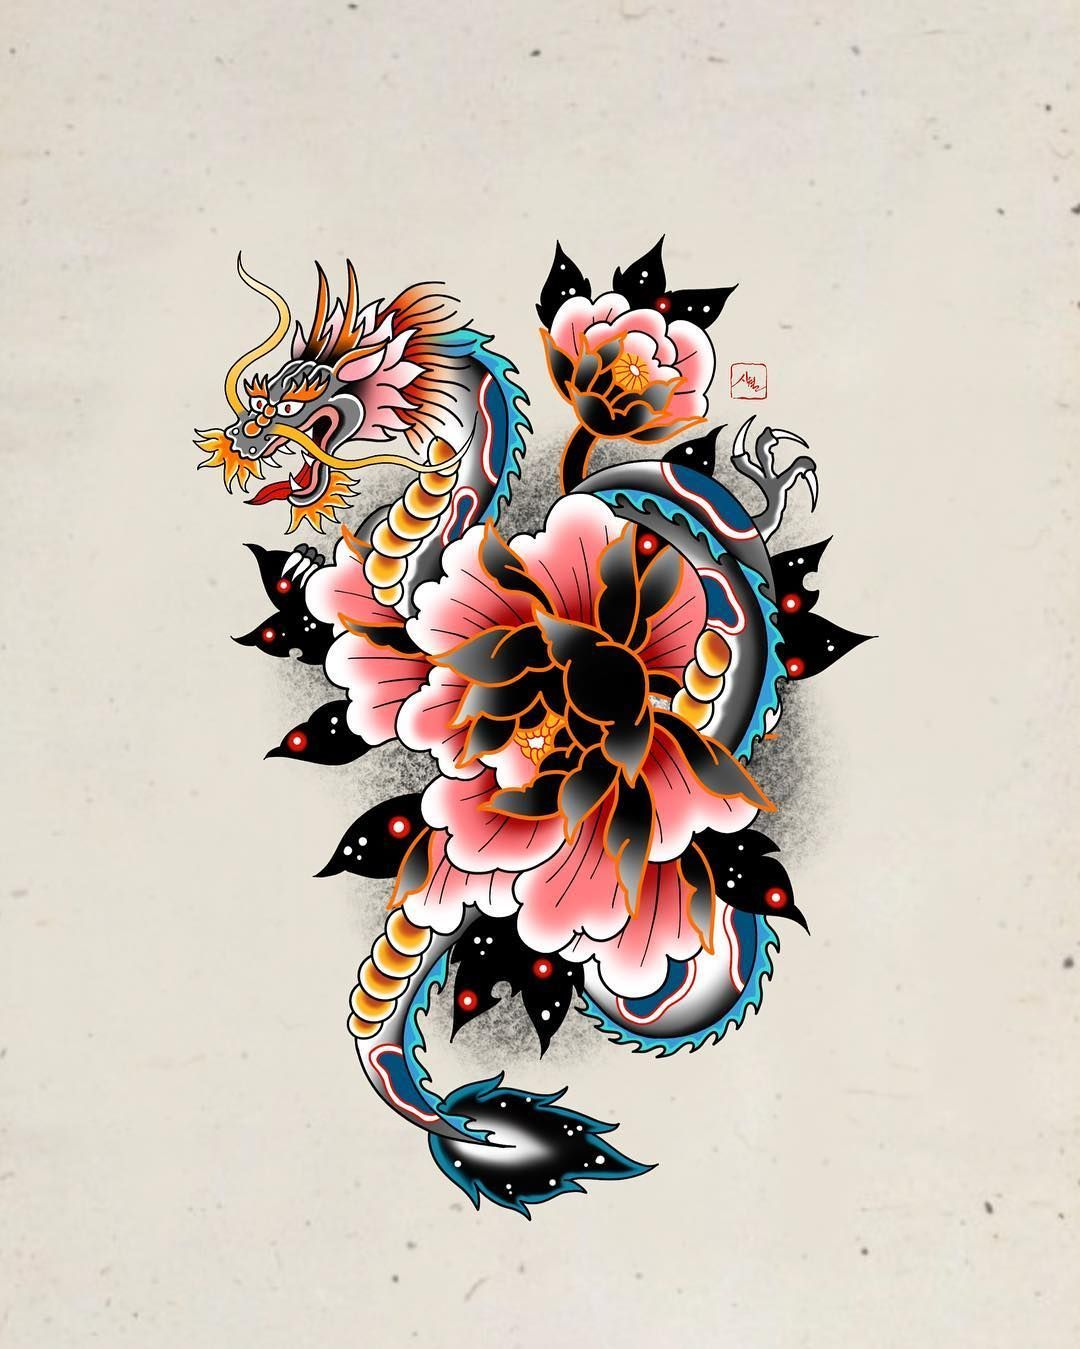 Peony and dragon illustration  tattoo flash 시월  shiwol on Instagram  Peony and dragon illustration  tattoo flash 시월  shiwol on Instagram